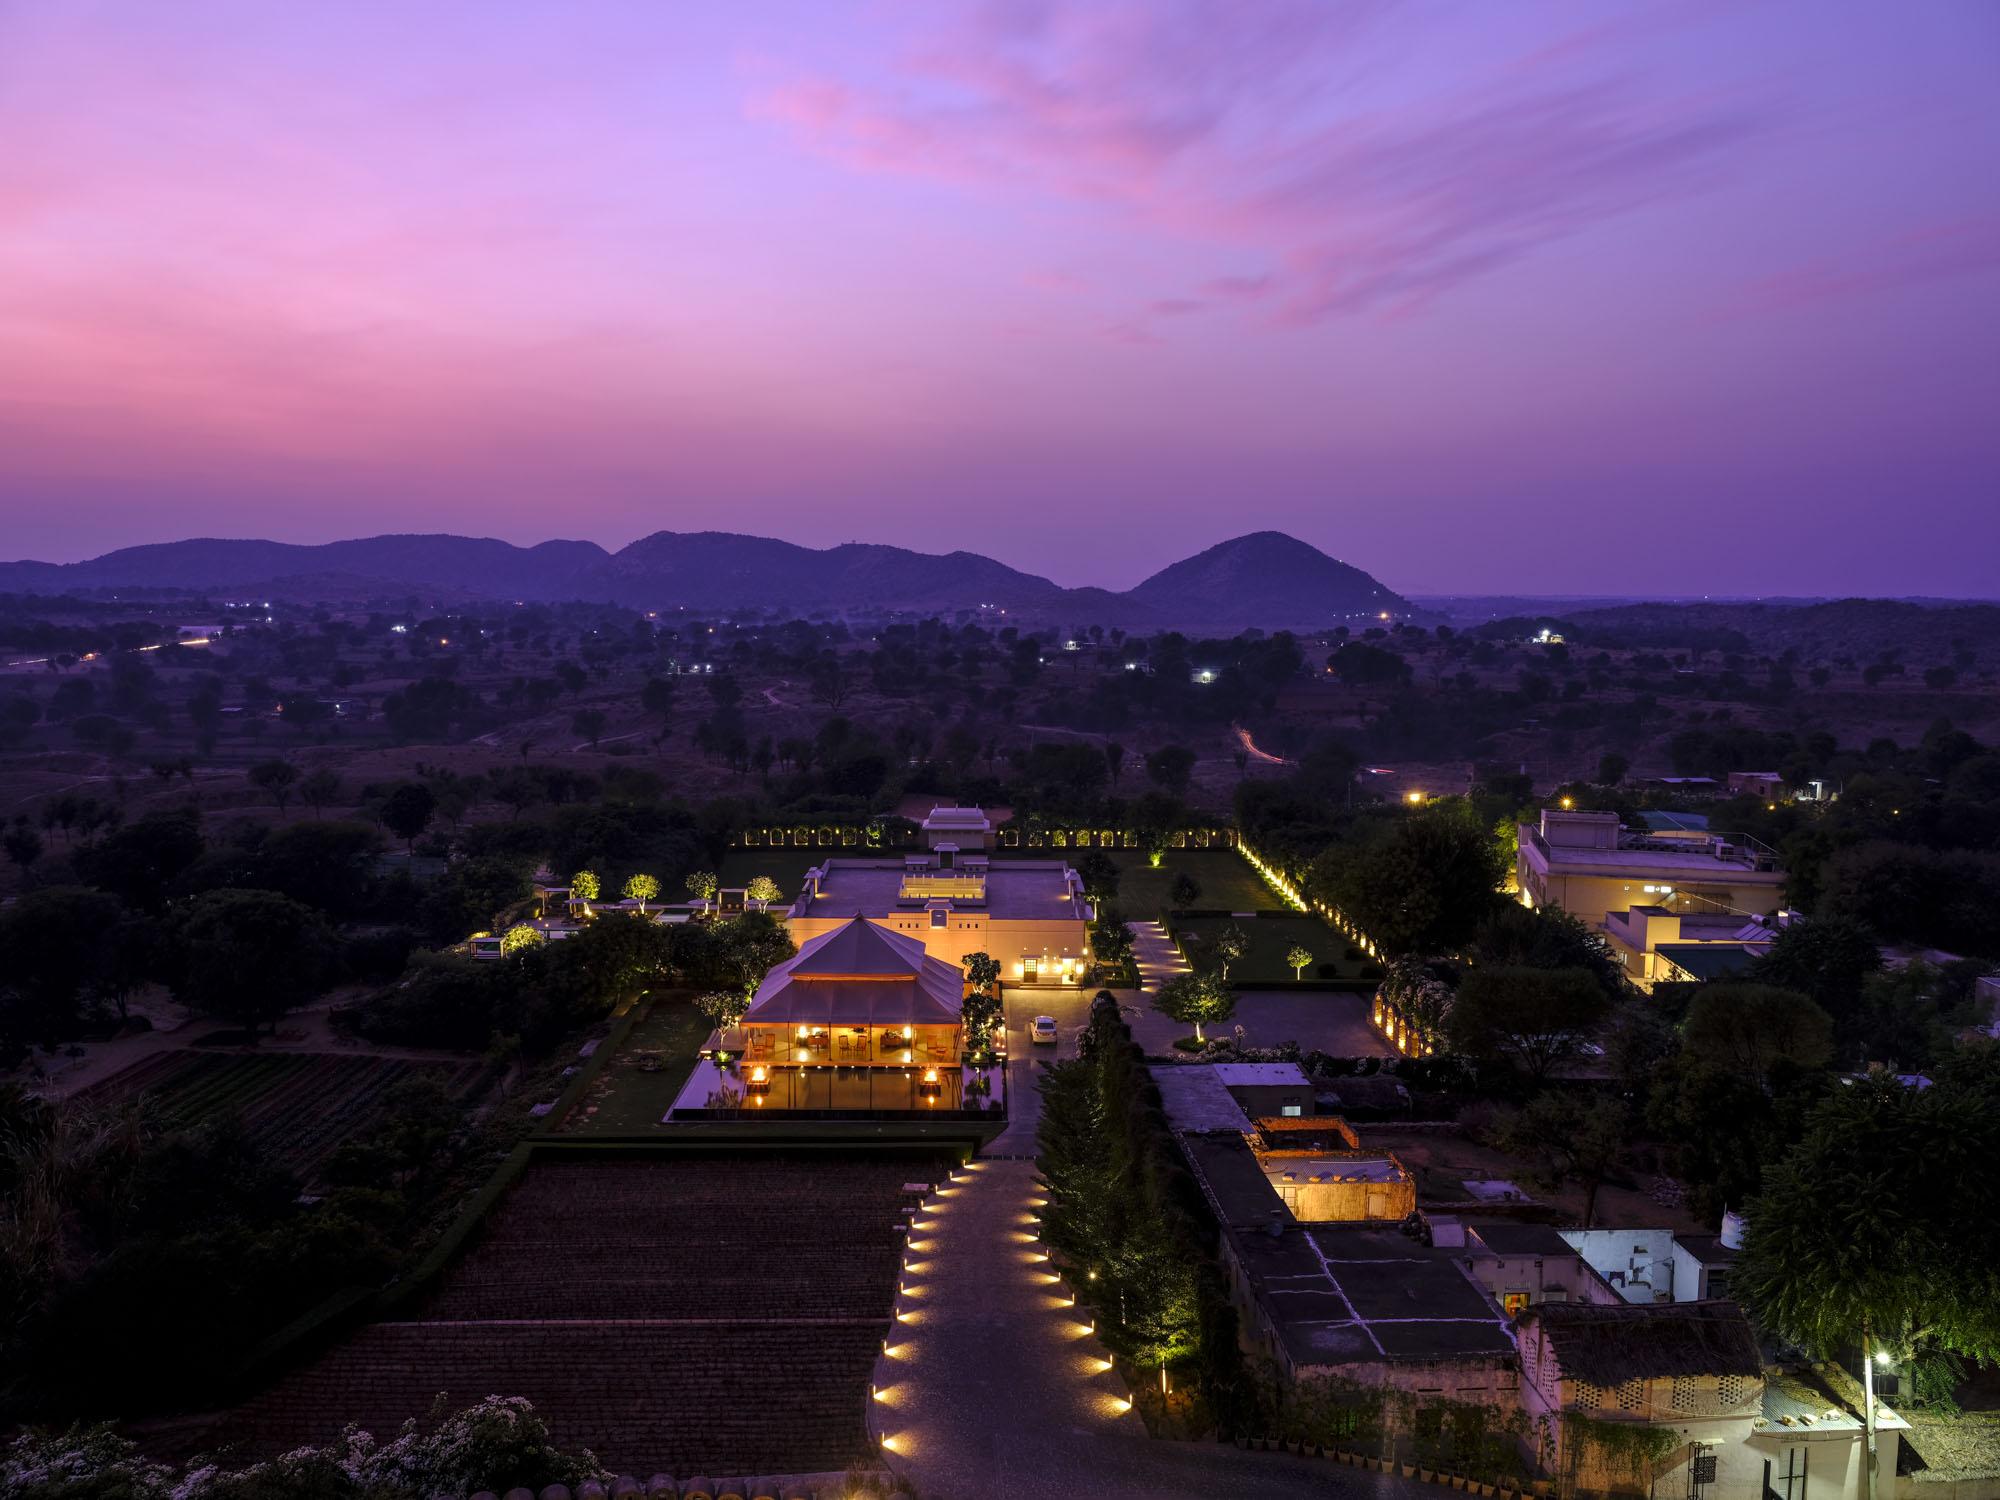 Tourism board travel photography services singapore asia photographer Hyatt Alila Fort Bishangarh Jaipur India 1